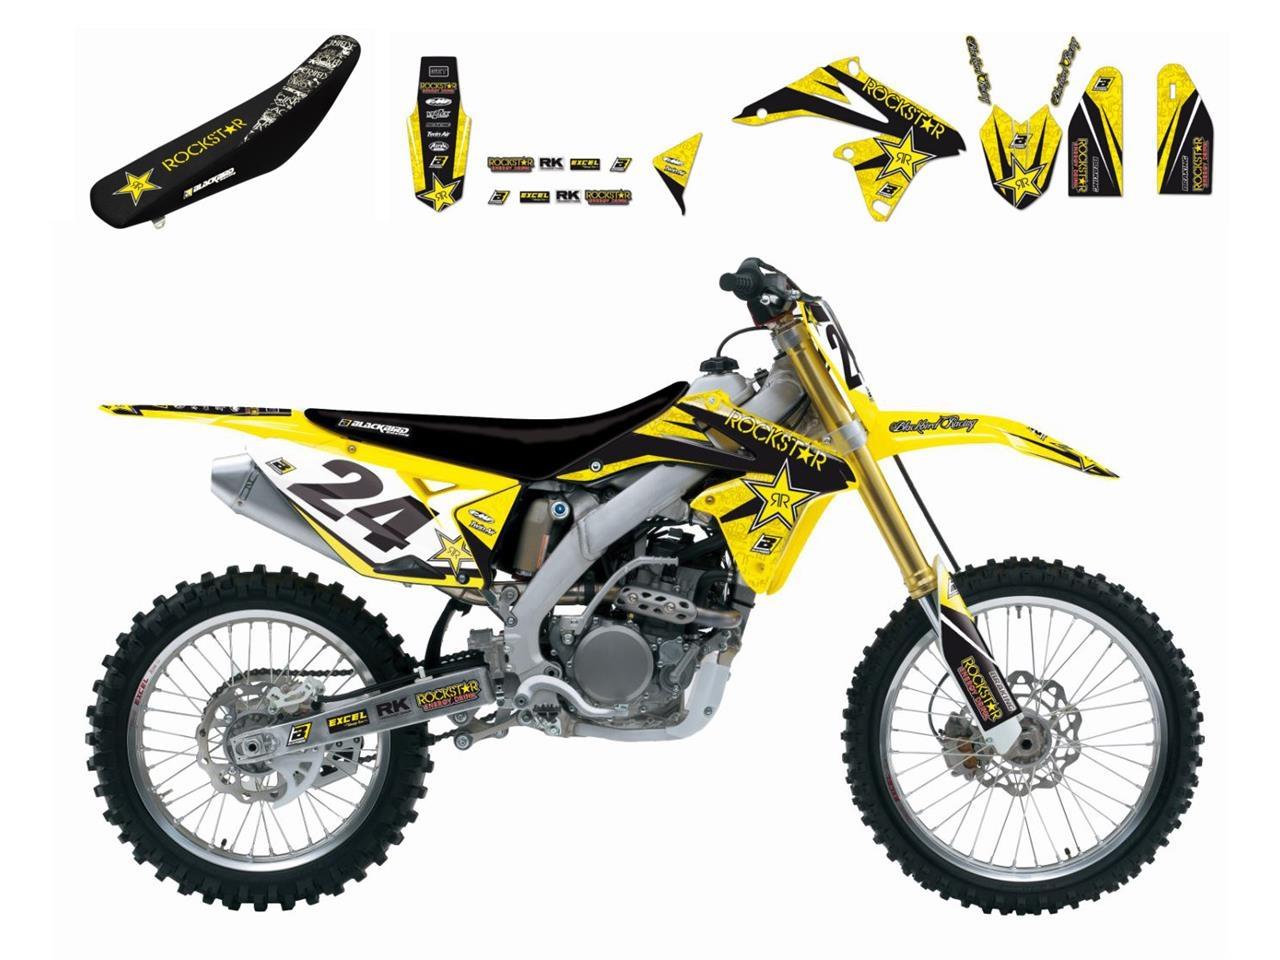 Kit déco + Housse de selle Blackbird Rockstar Energy Suzuki 250 RM 01-